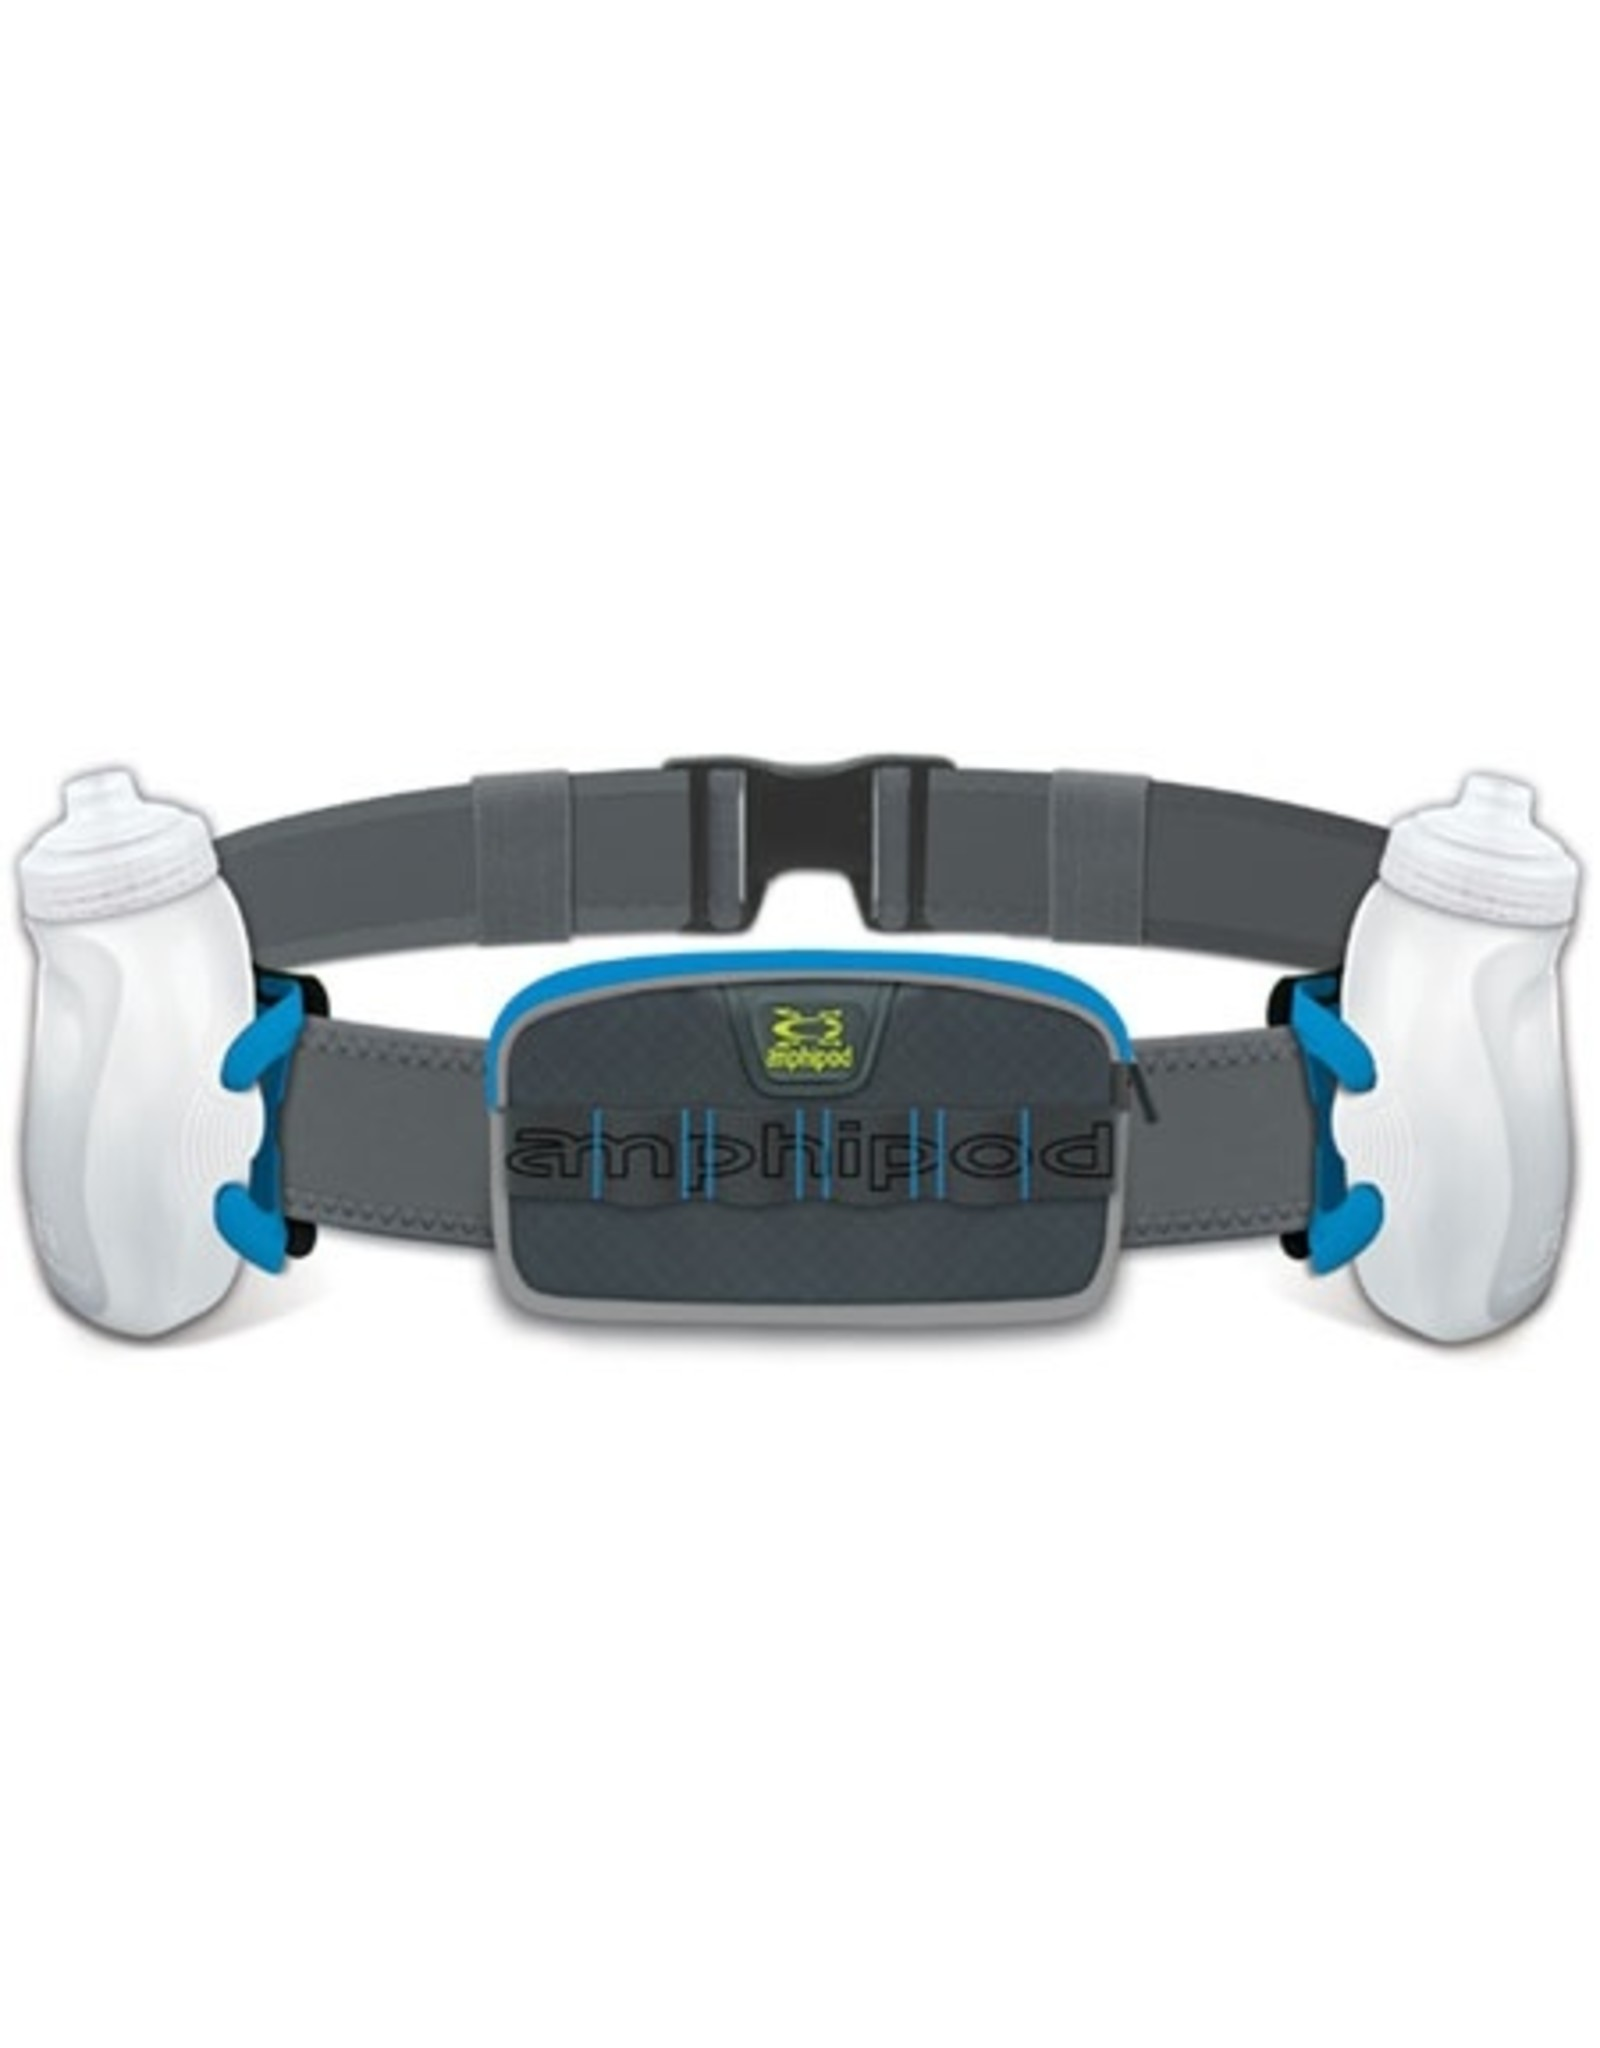 Amphipod - RunLite Xtech 2 Plus